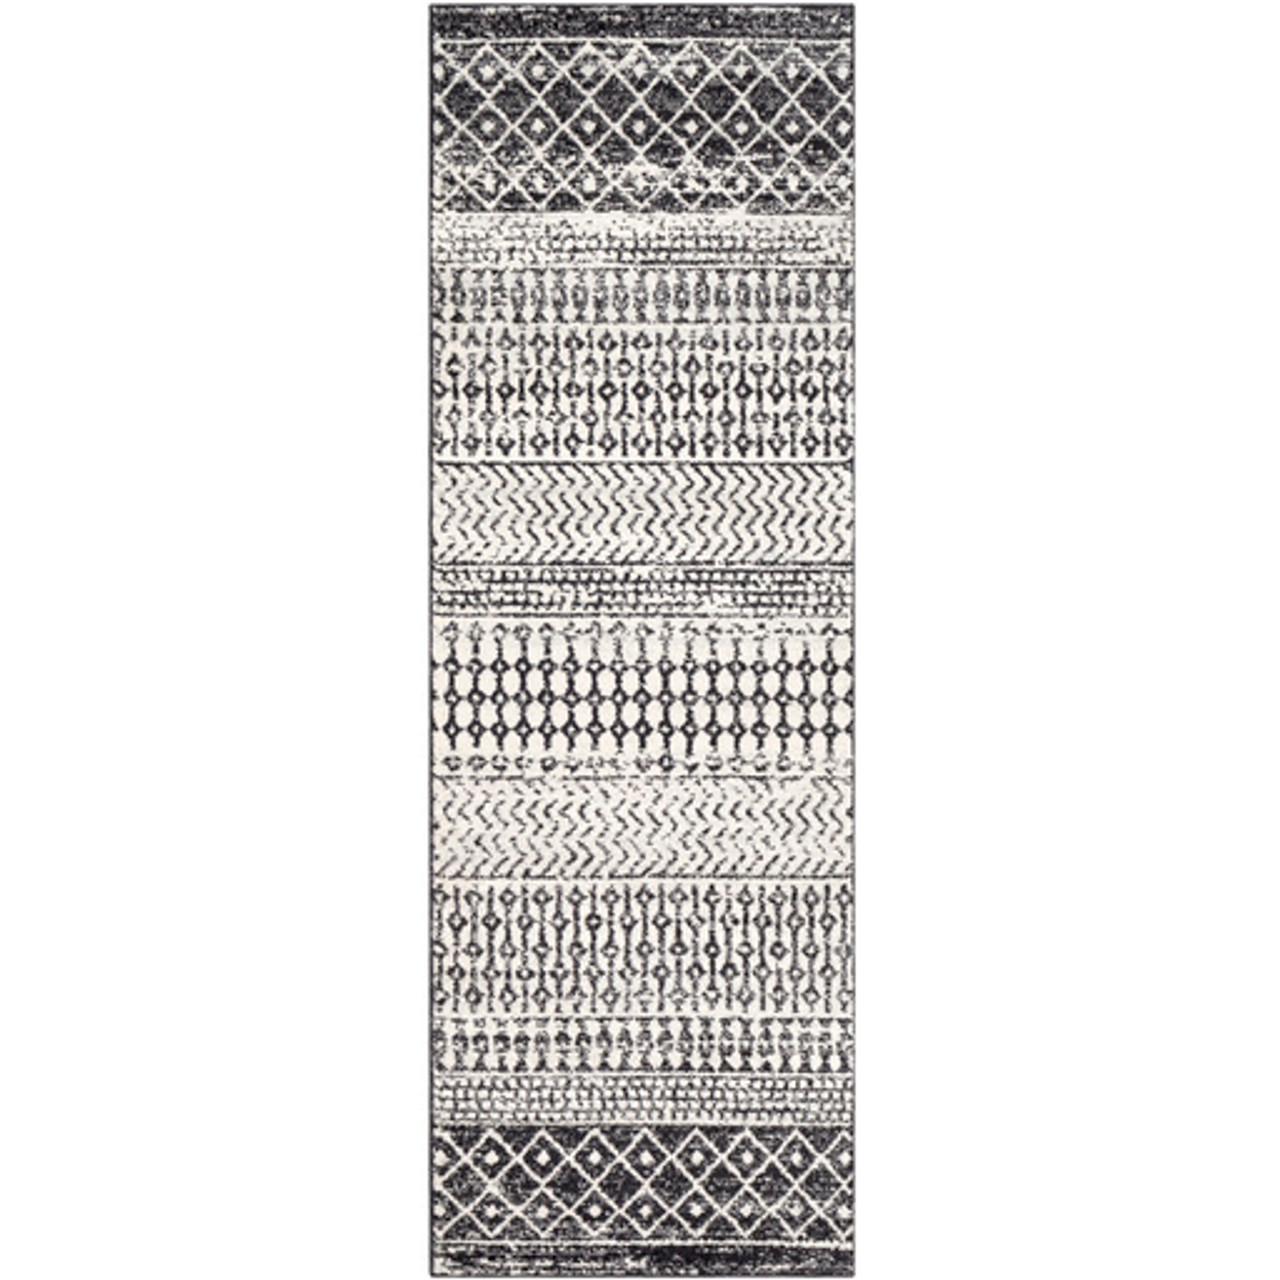 Black and White Calin Rug